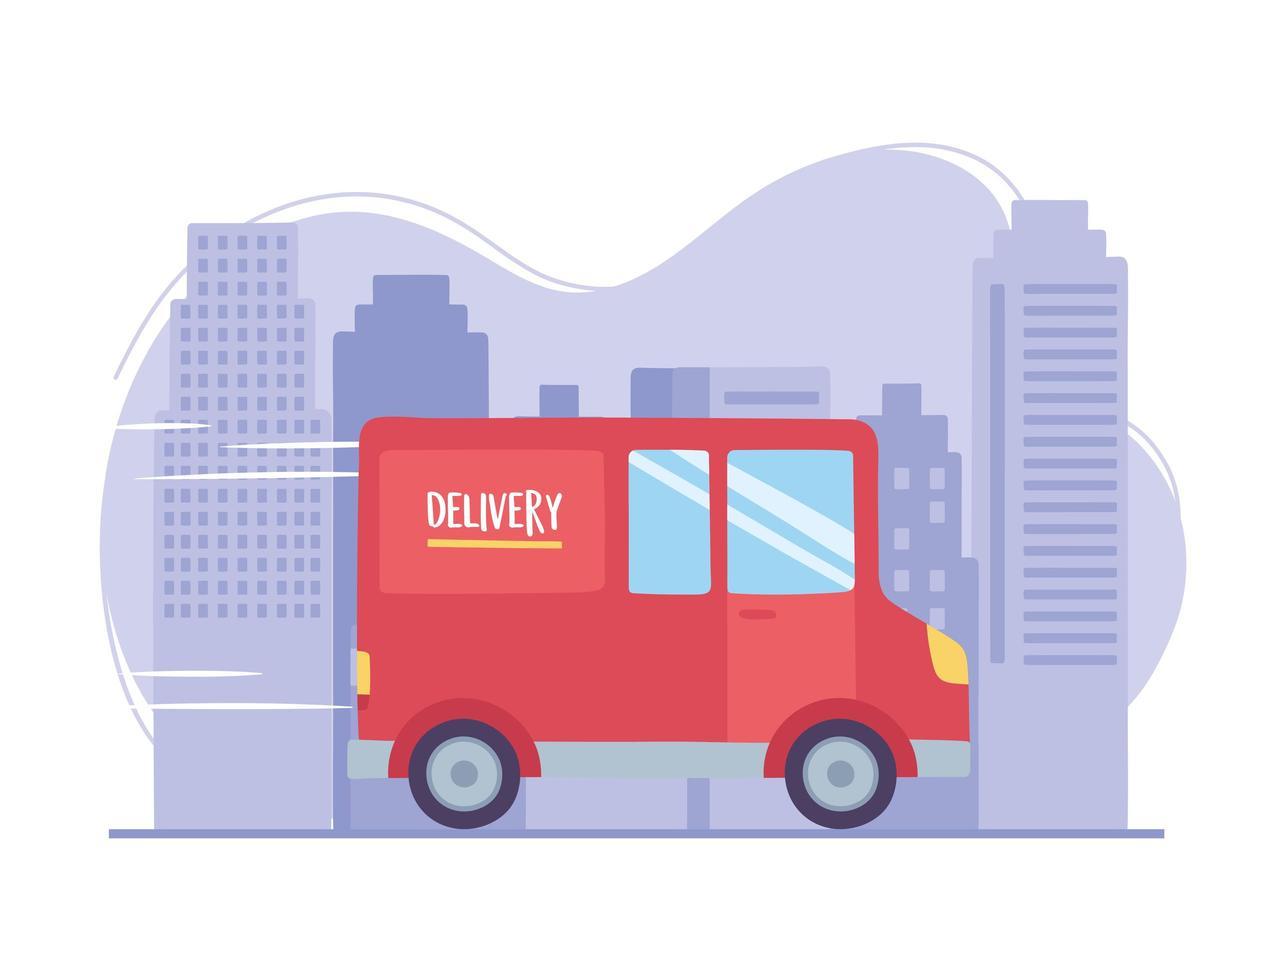 online leveransservice. lastbilstransport på stadsgatan vektor